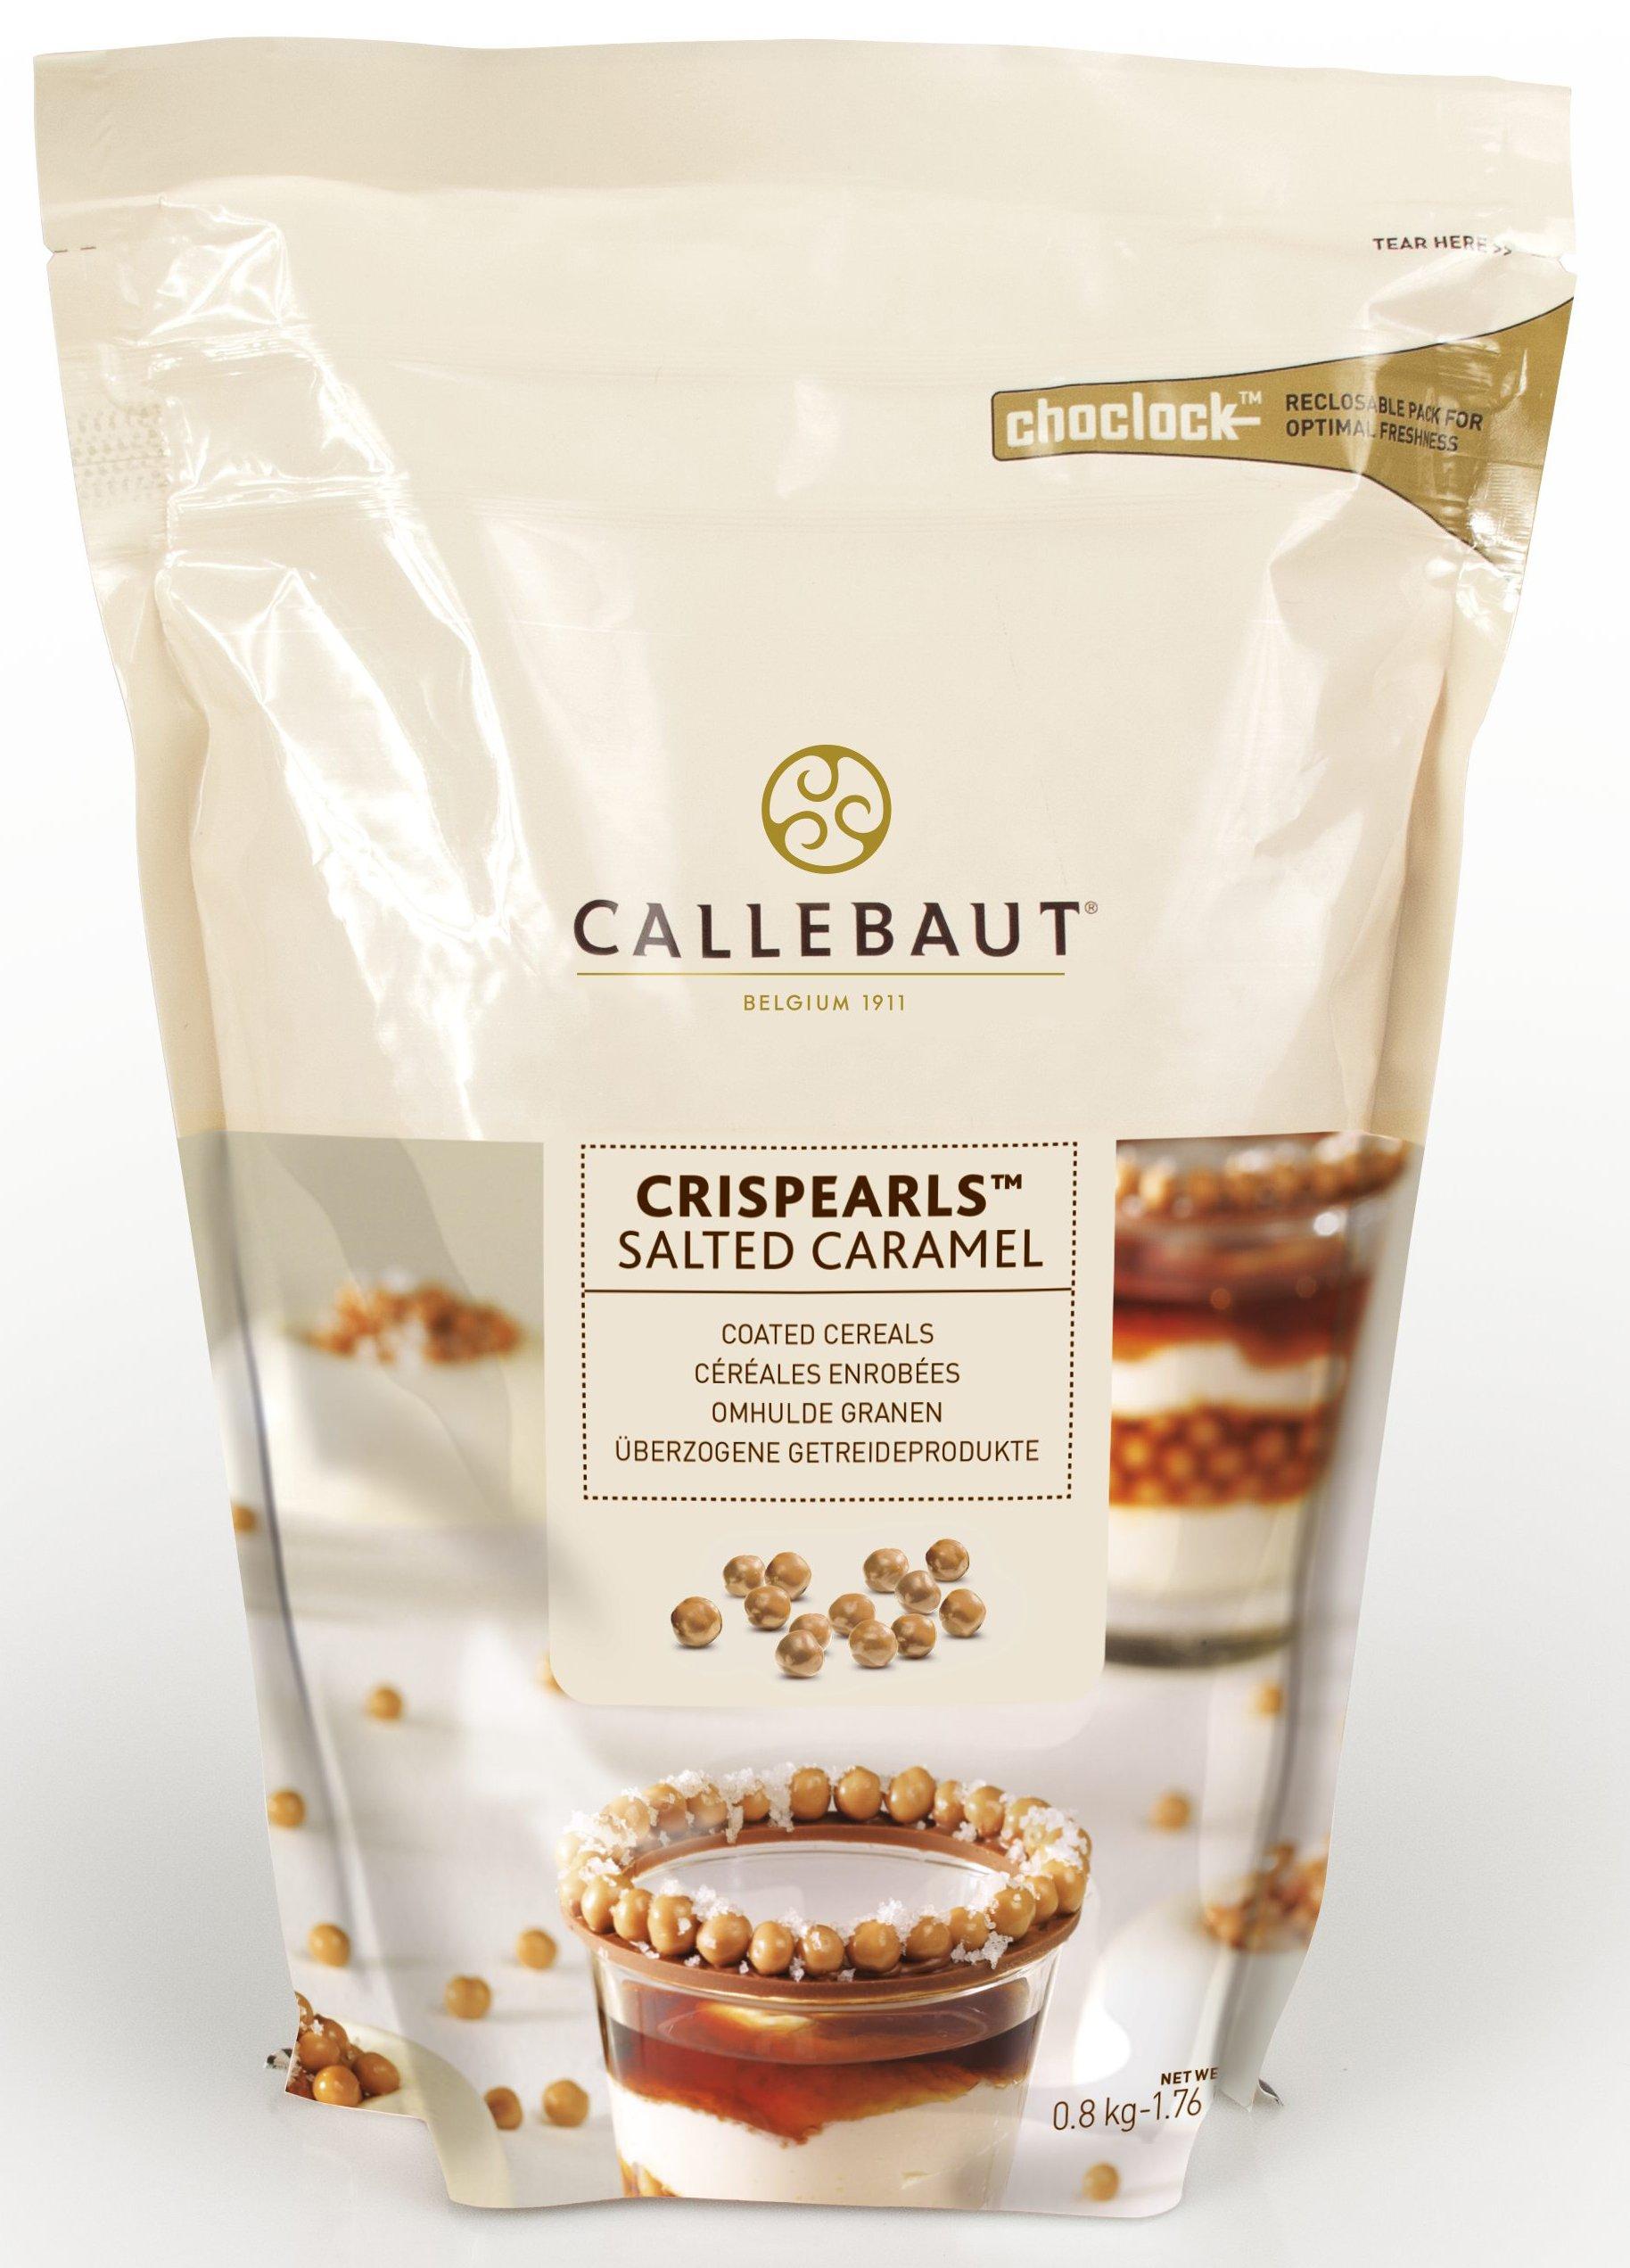 Callebaut Crispearls Salted Caramel 1.76 lbs